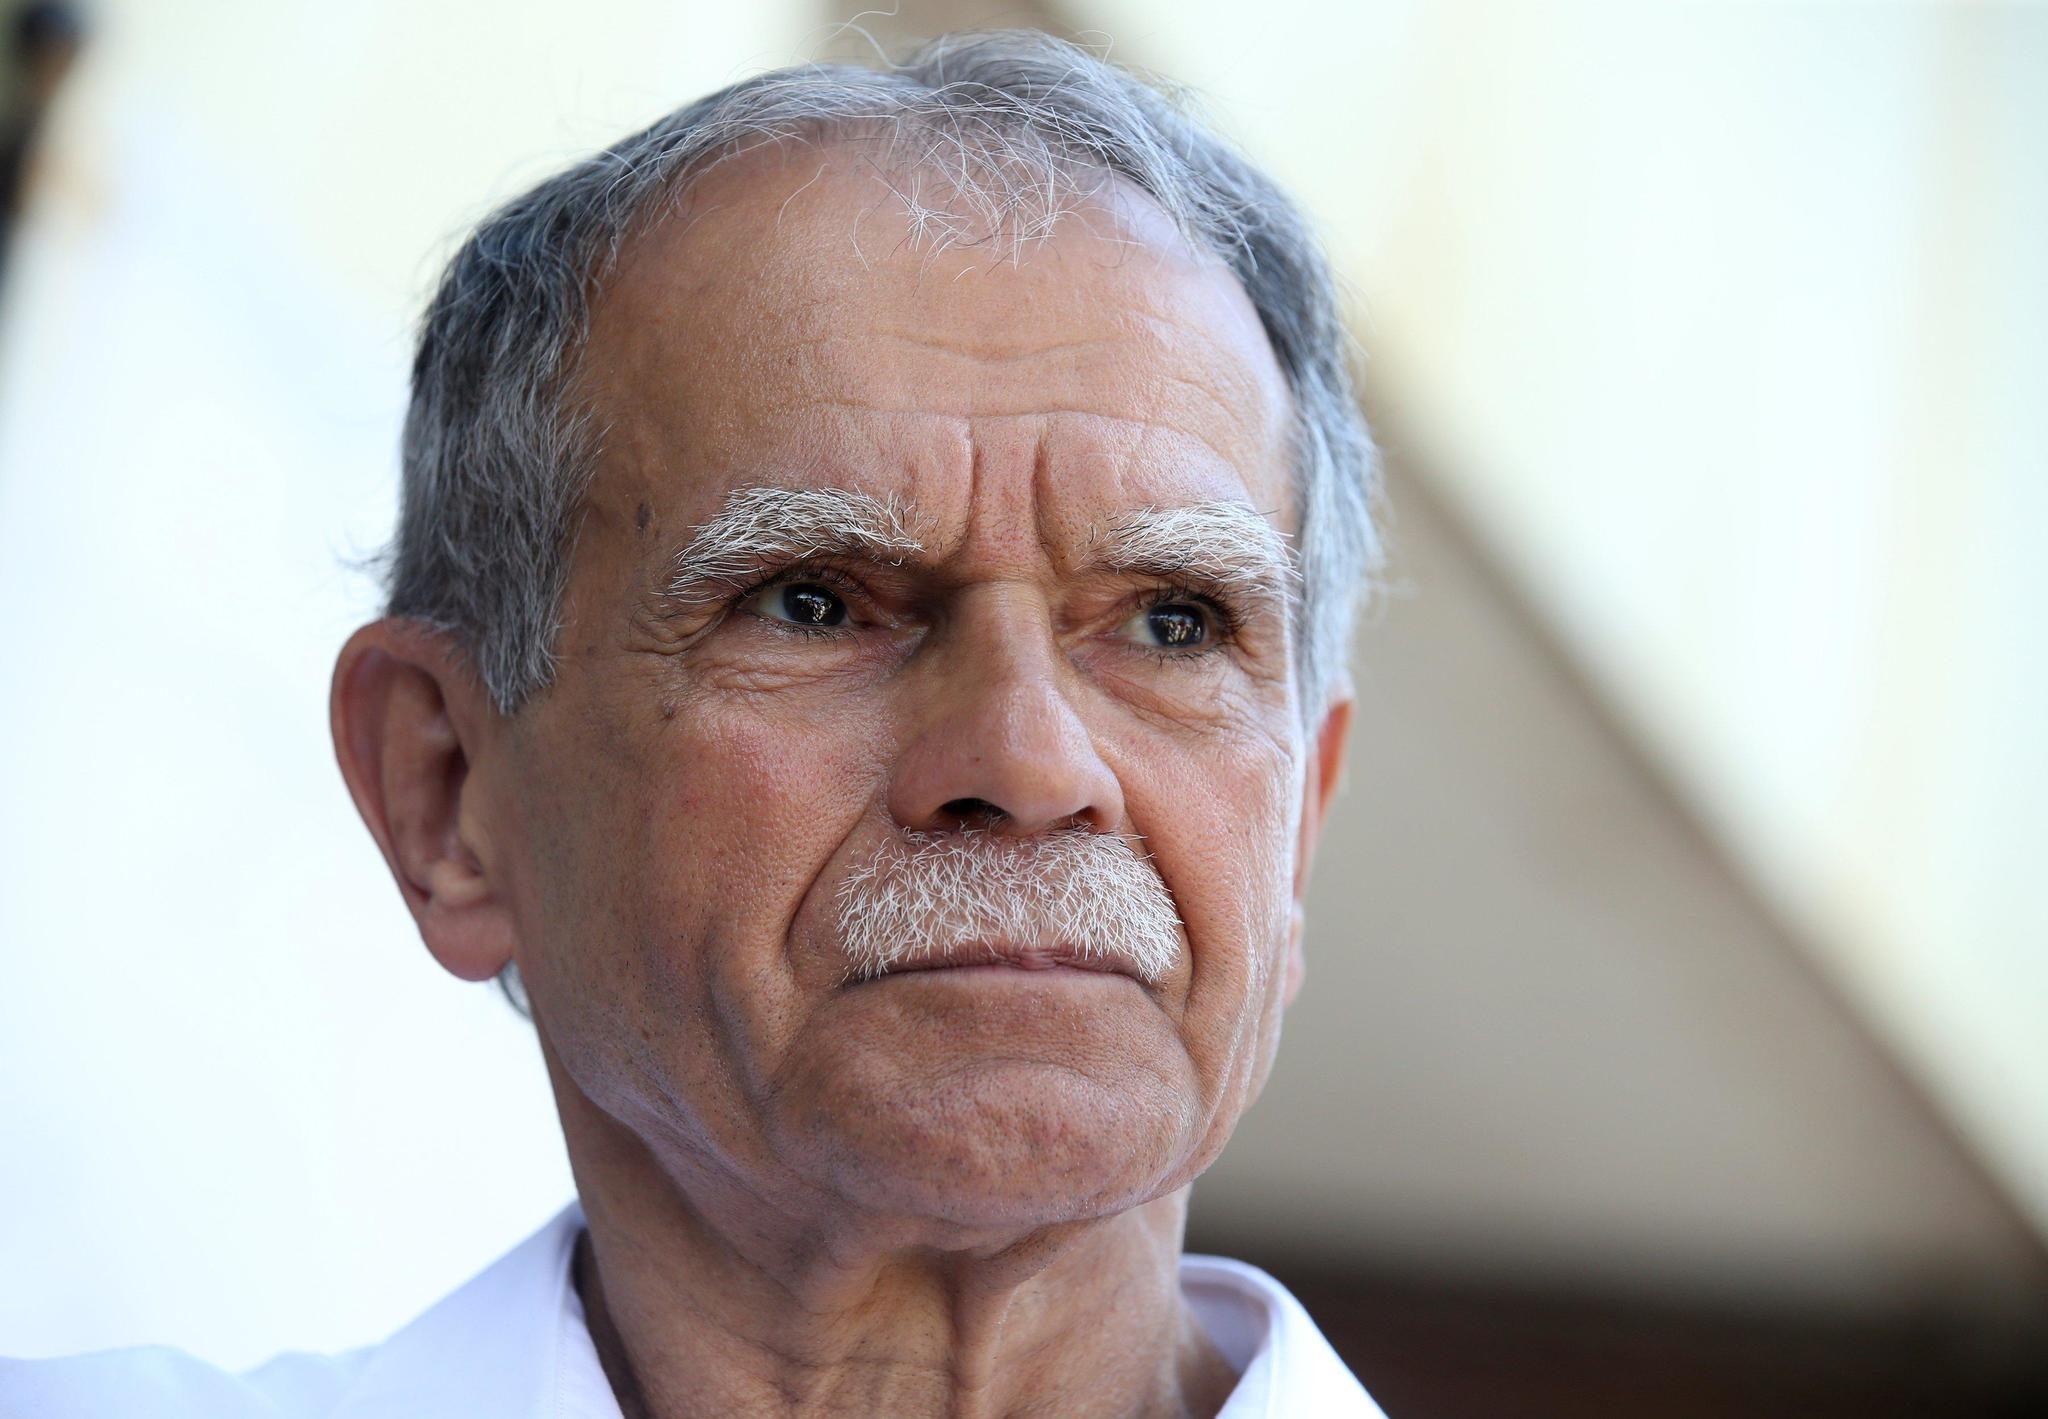 Lopez Rivera